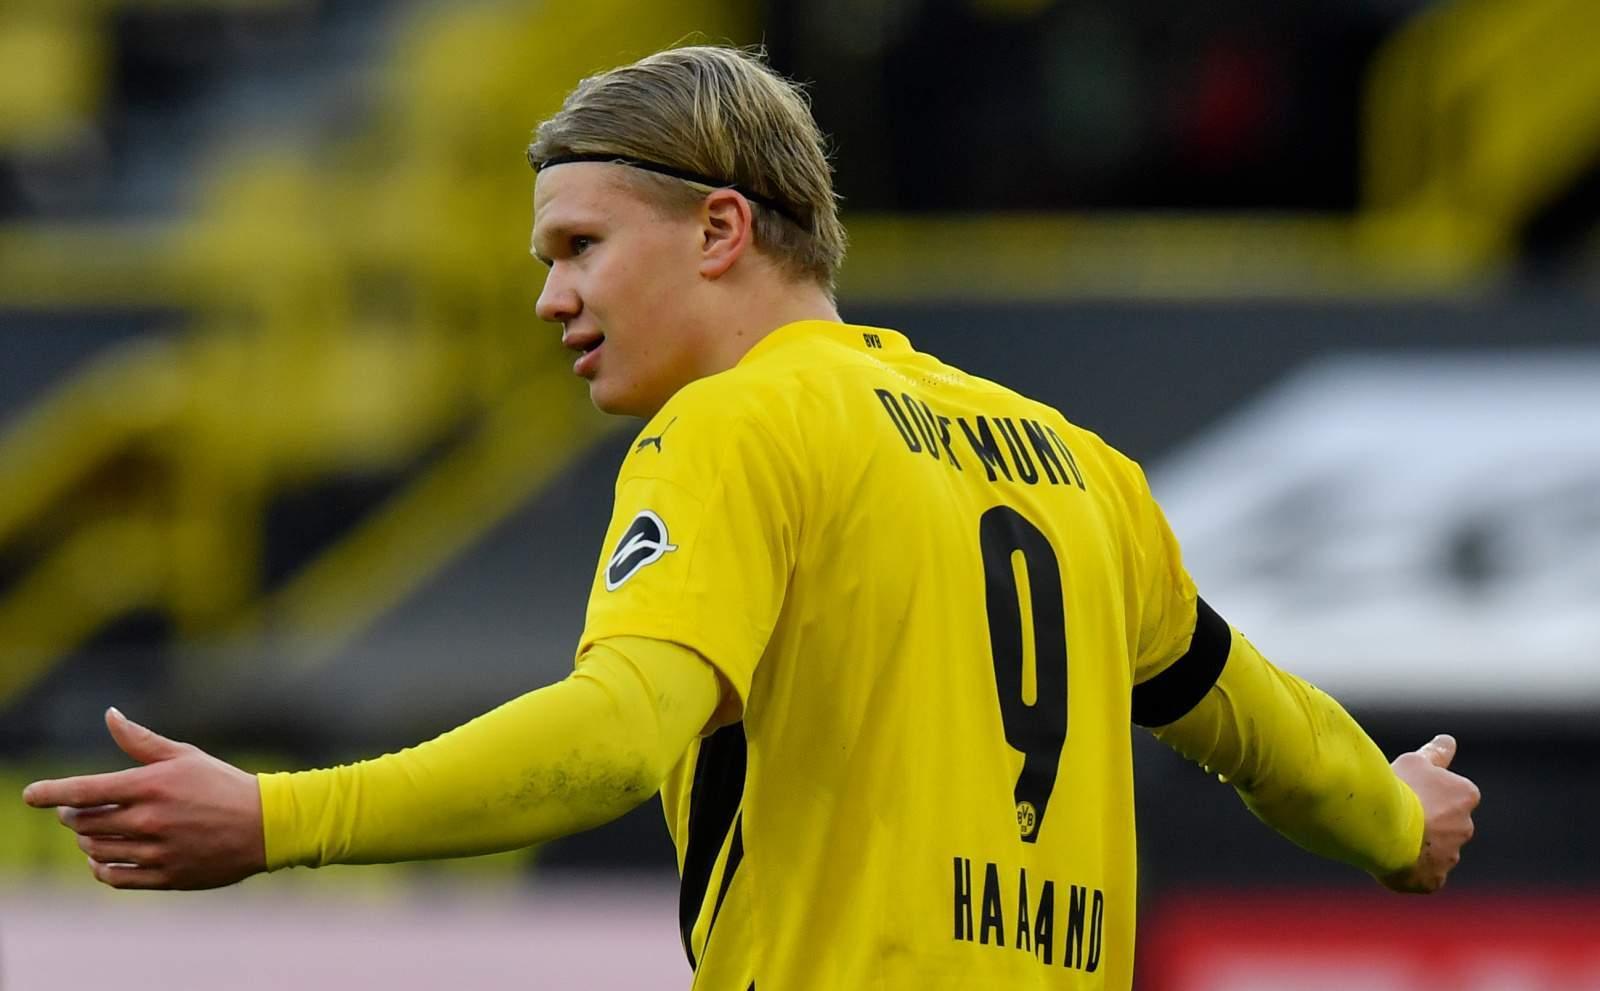 Разгромная победа «Боруссии» Дортмунд в финале Кубка - видео